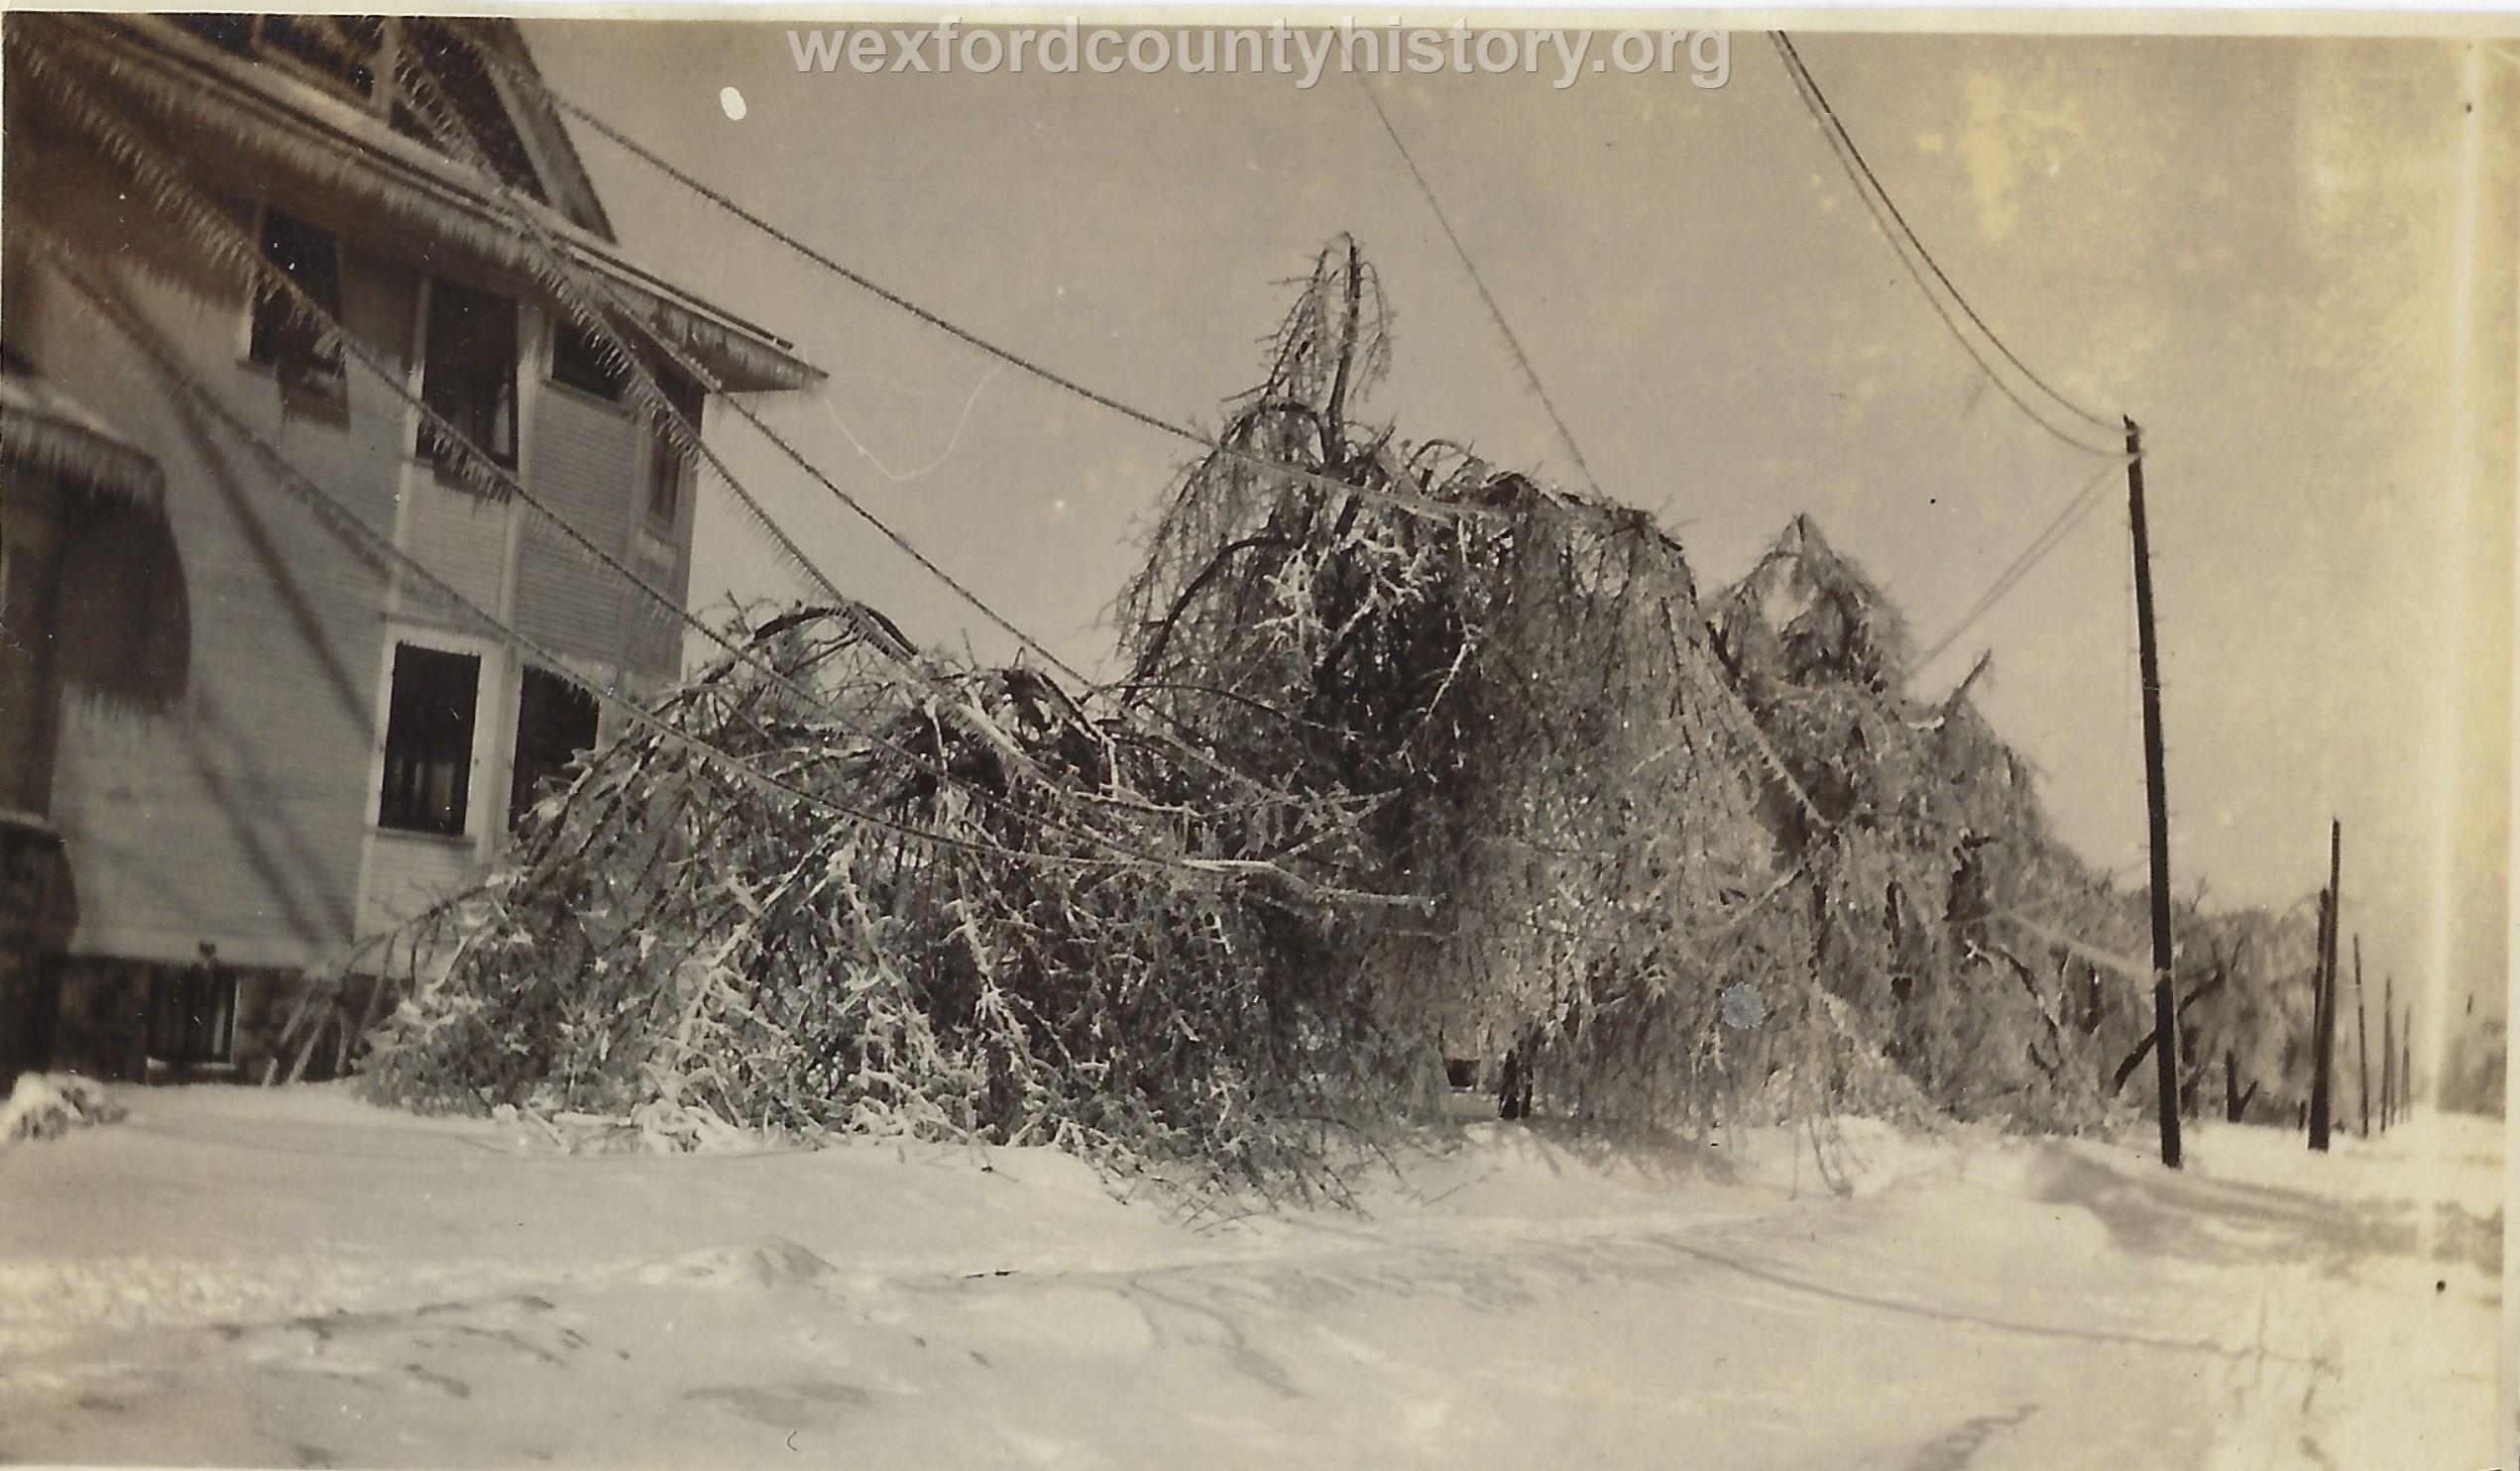 1922 Ice Storm - House